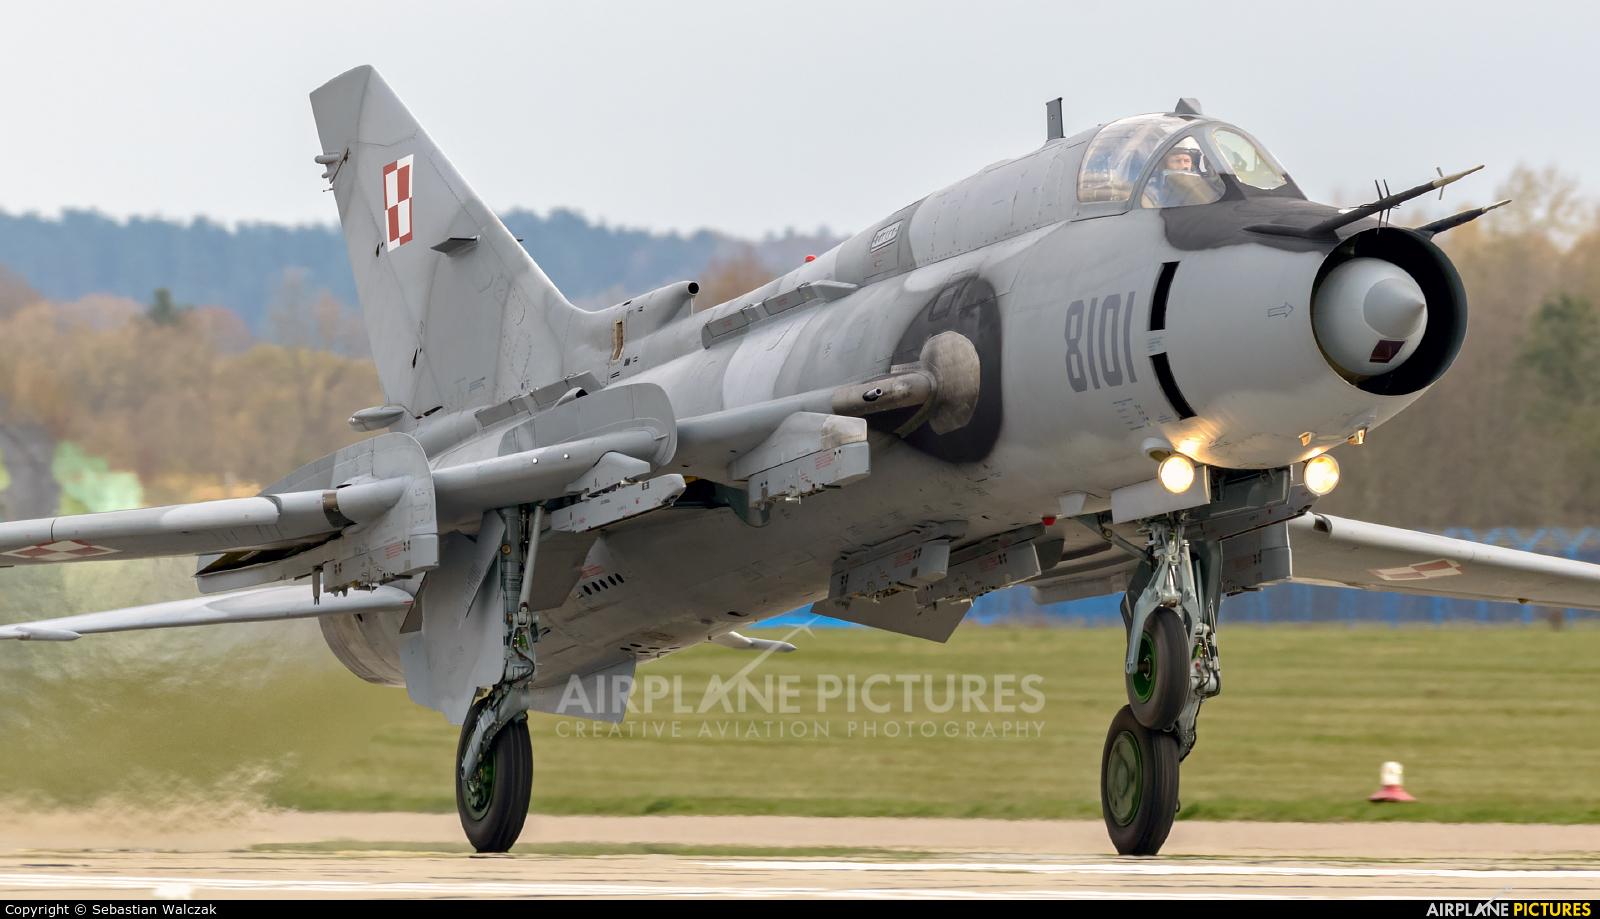 Poland - Air Force 8101 aircraft at Świdwin